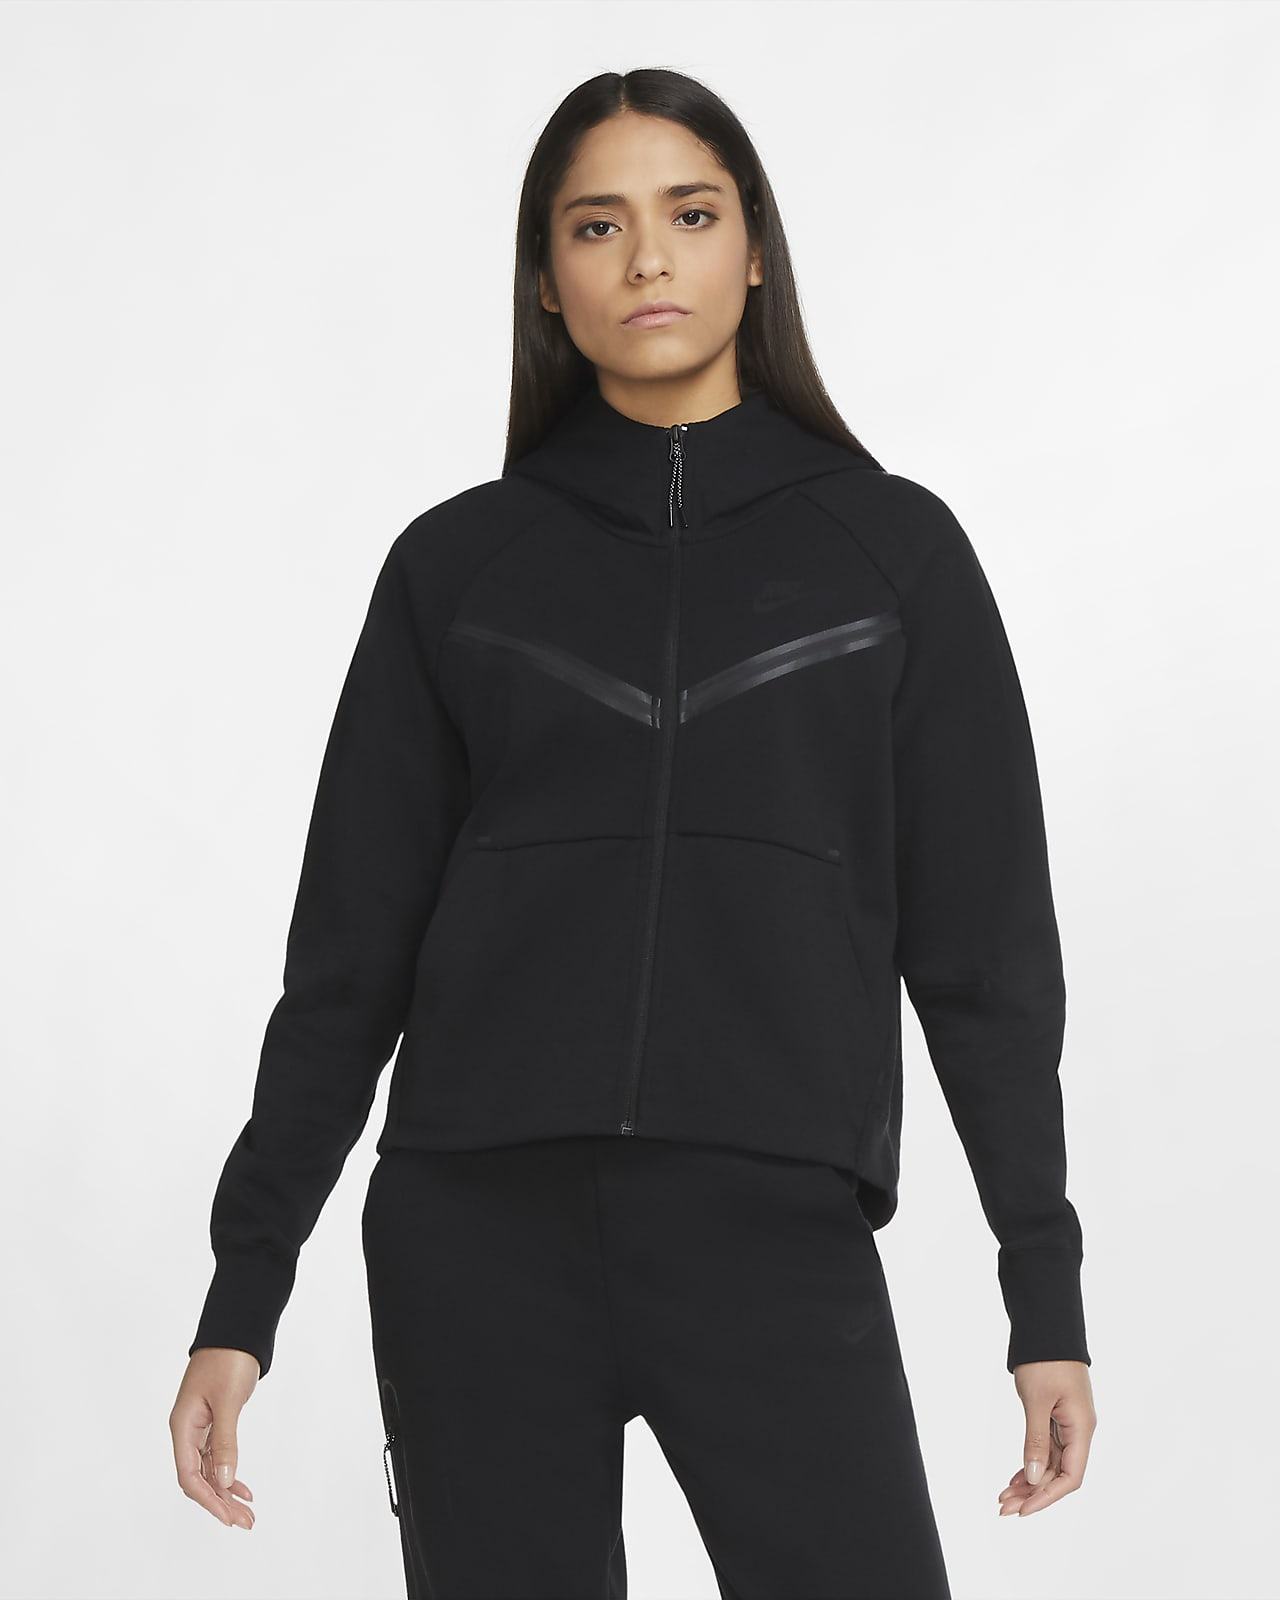 Nike Sportswear Tech Fleece Windrunner 女子全长拉链开襟连帽衫